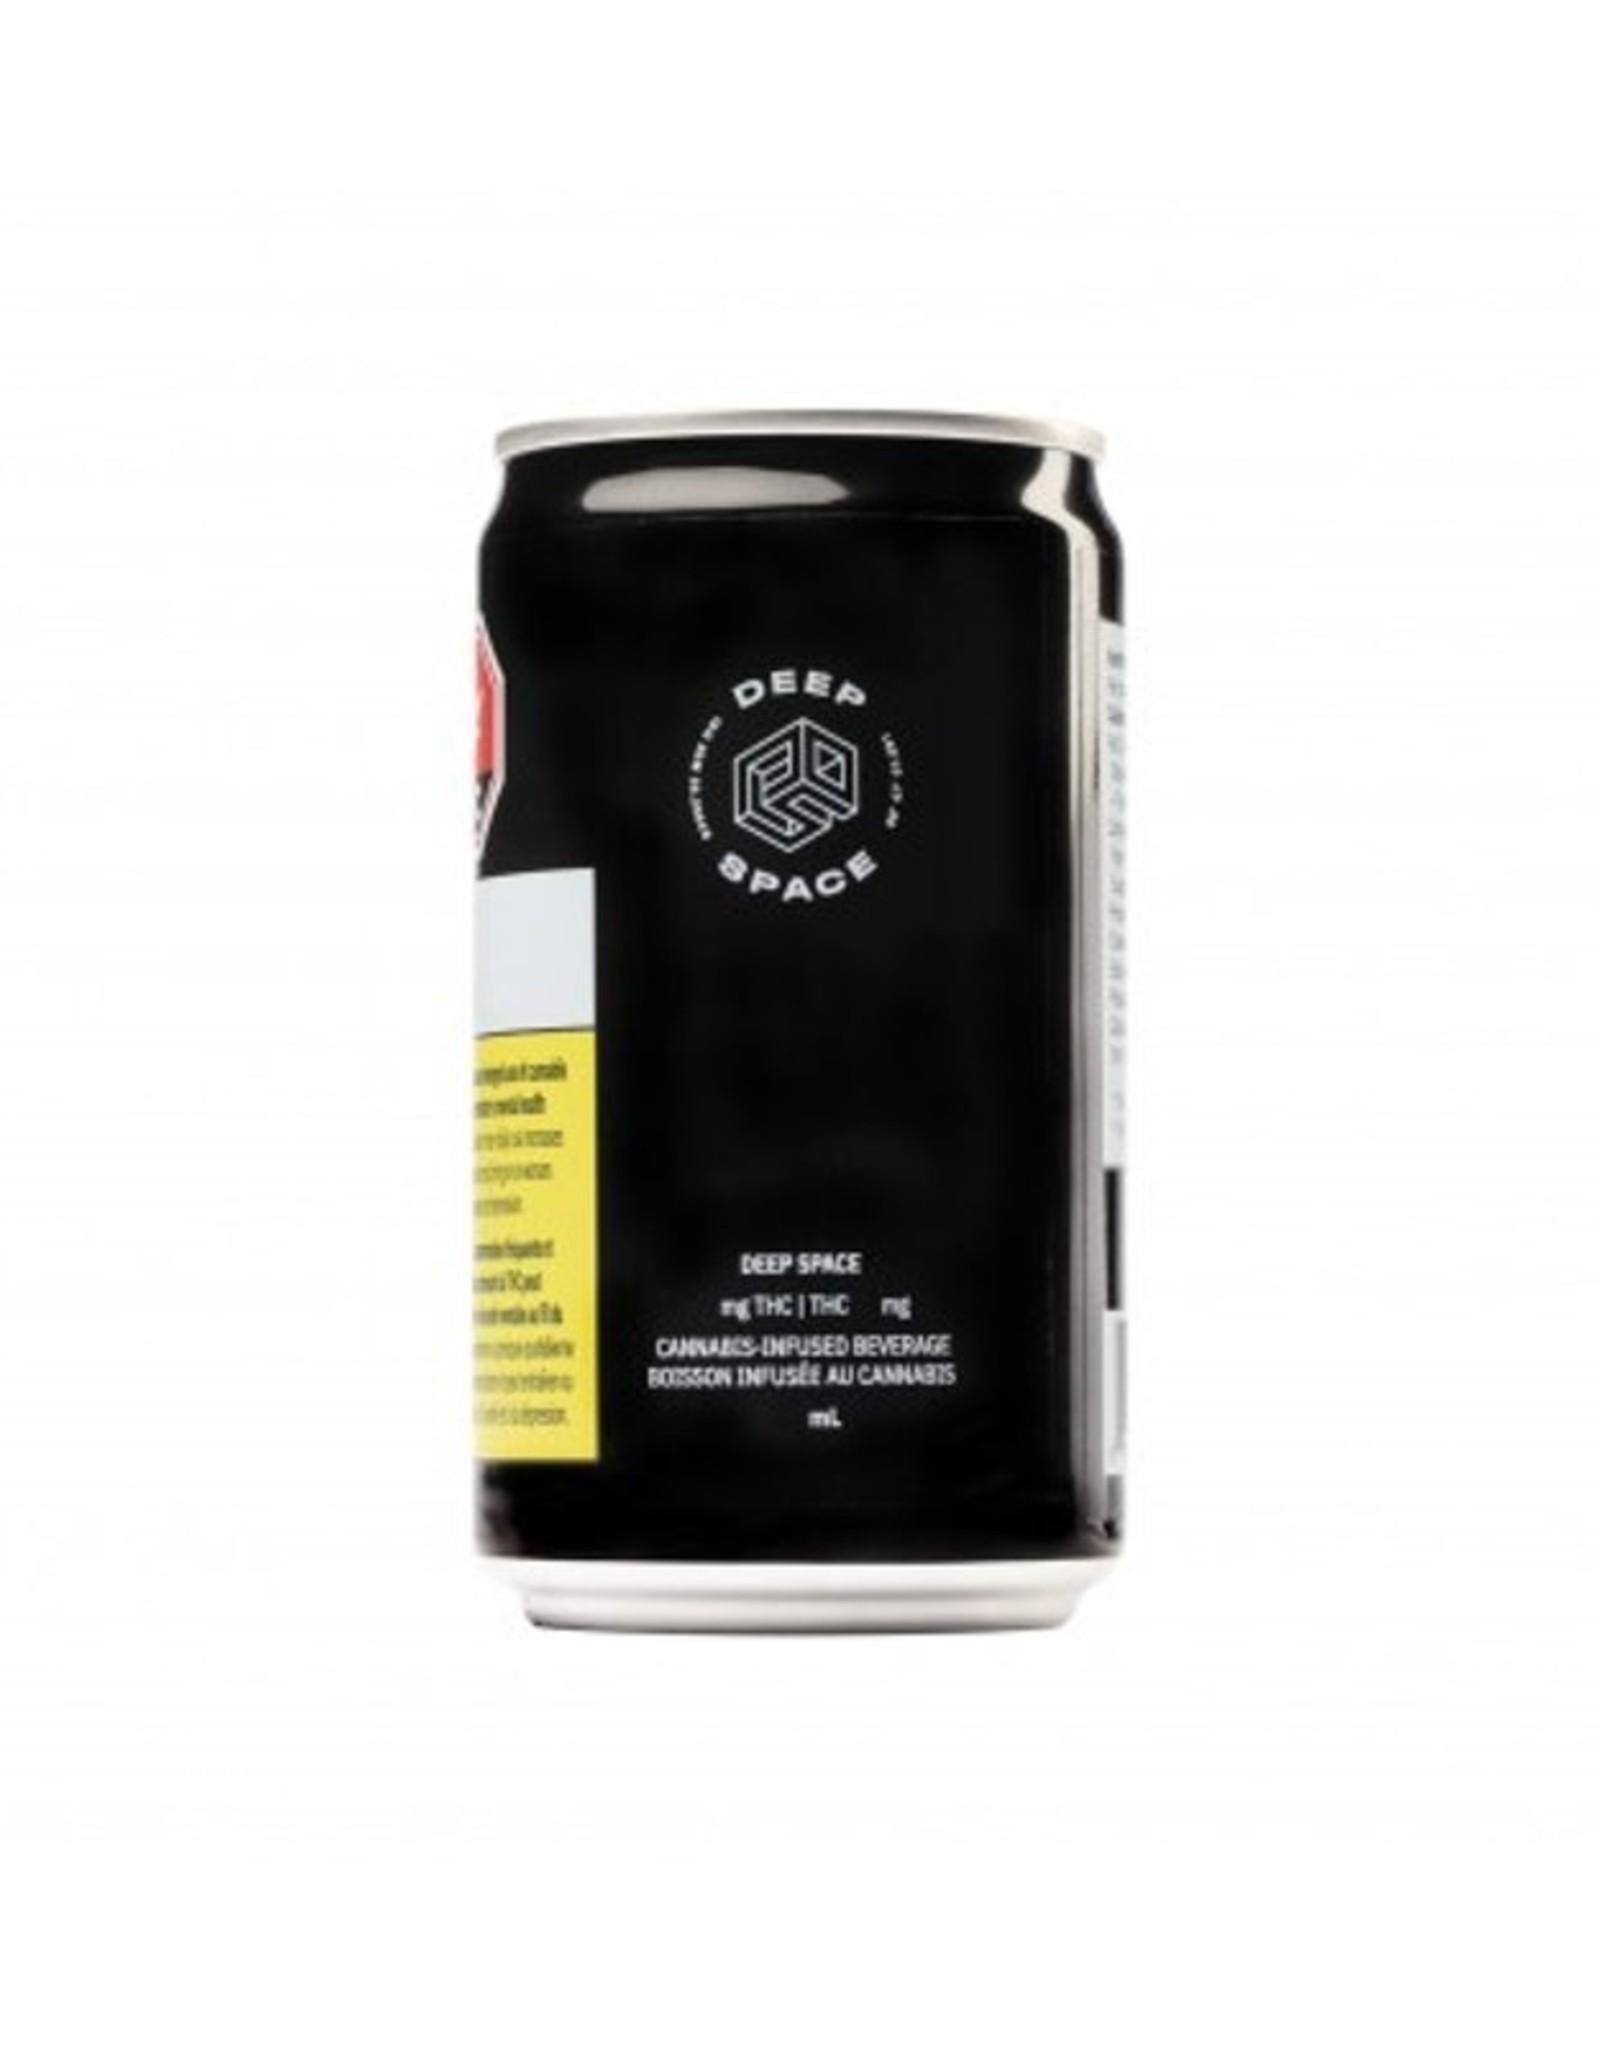 Deep Space Carbonated Drink